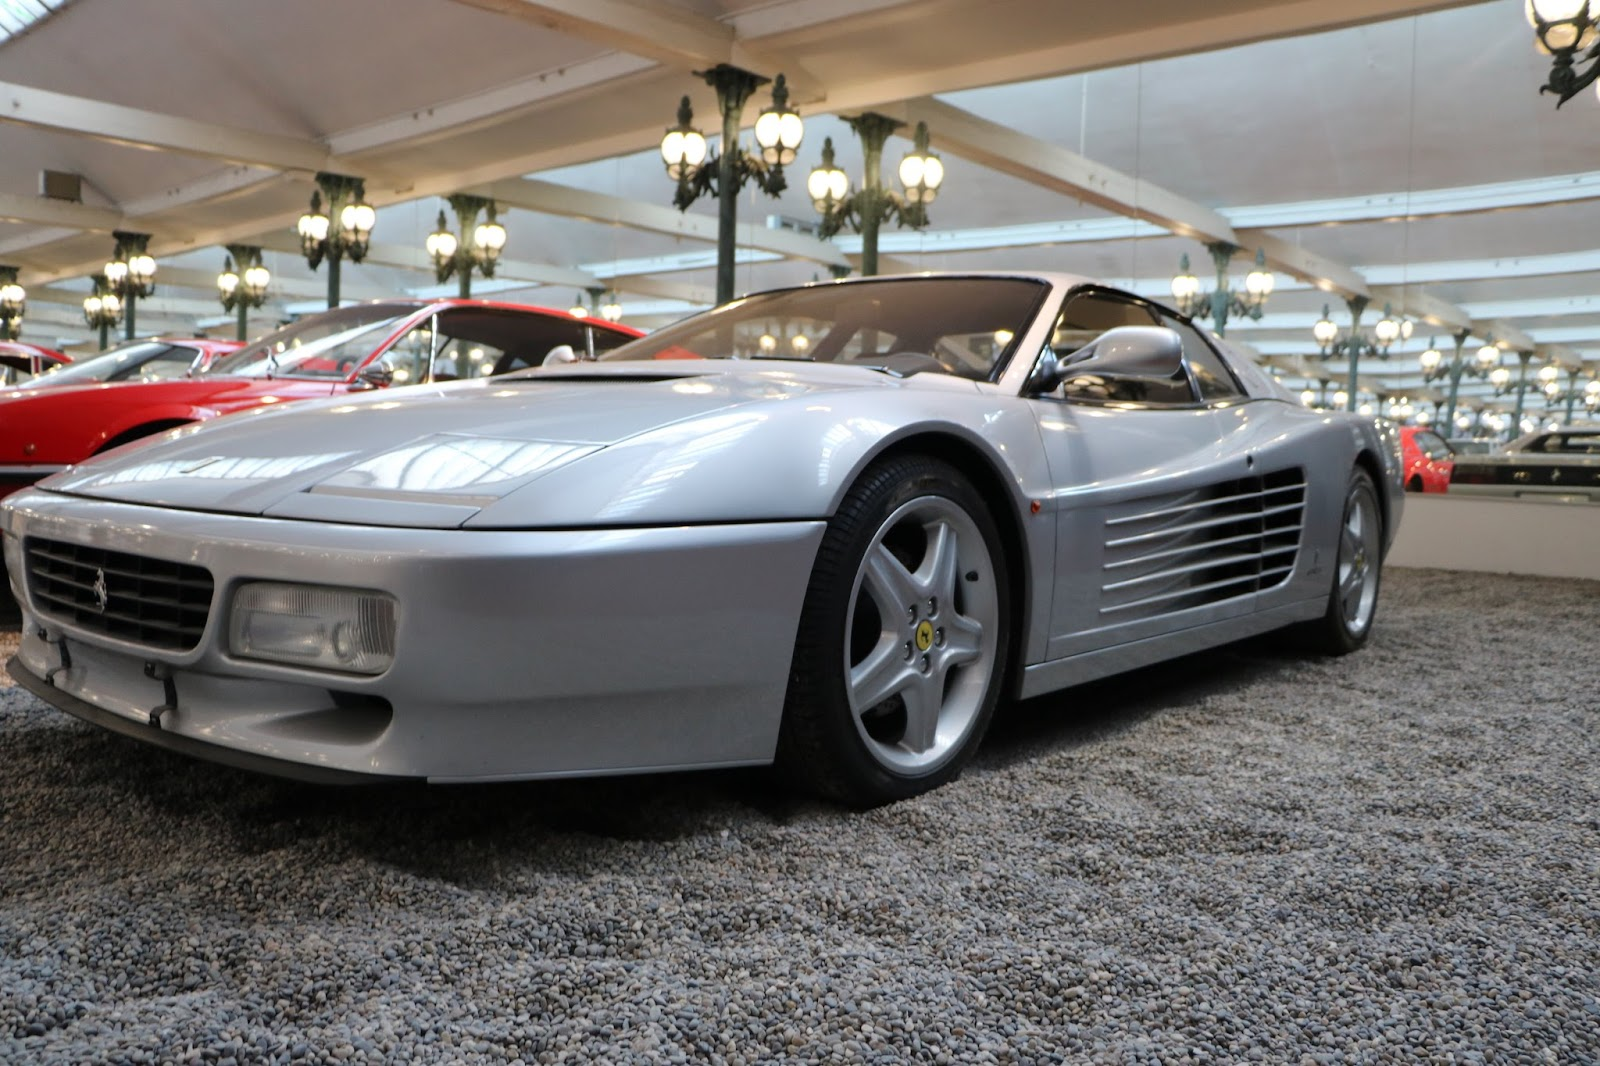 Schlumpf Collection 0950 - 1992 Ferrari Testarossa Coupe Type 512 TR.jpg